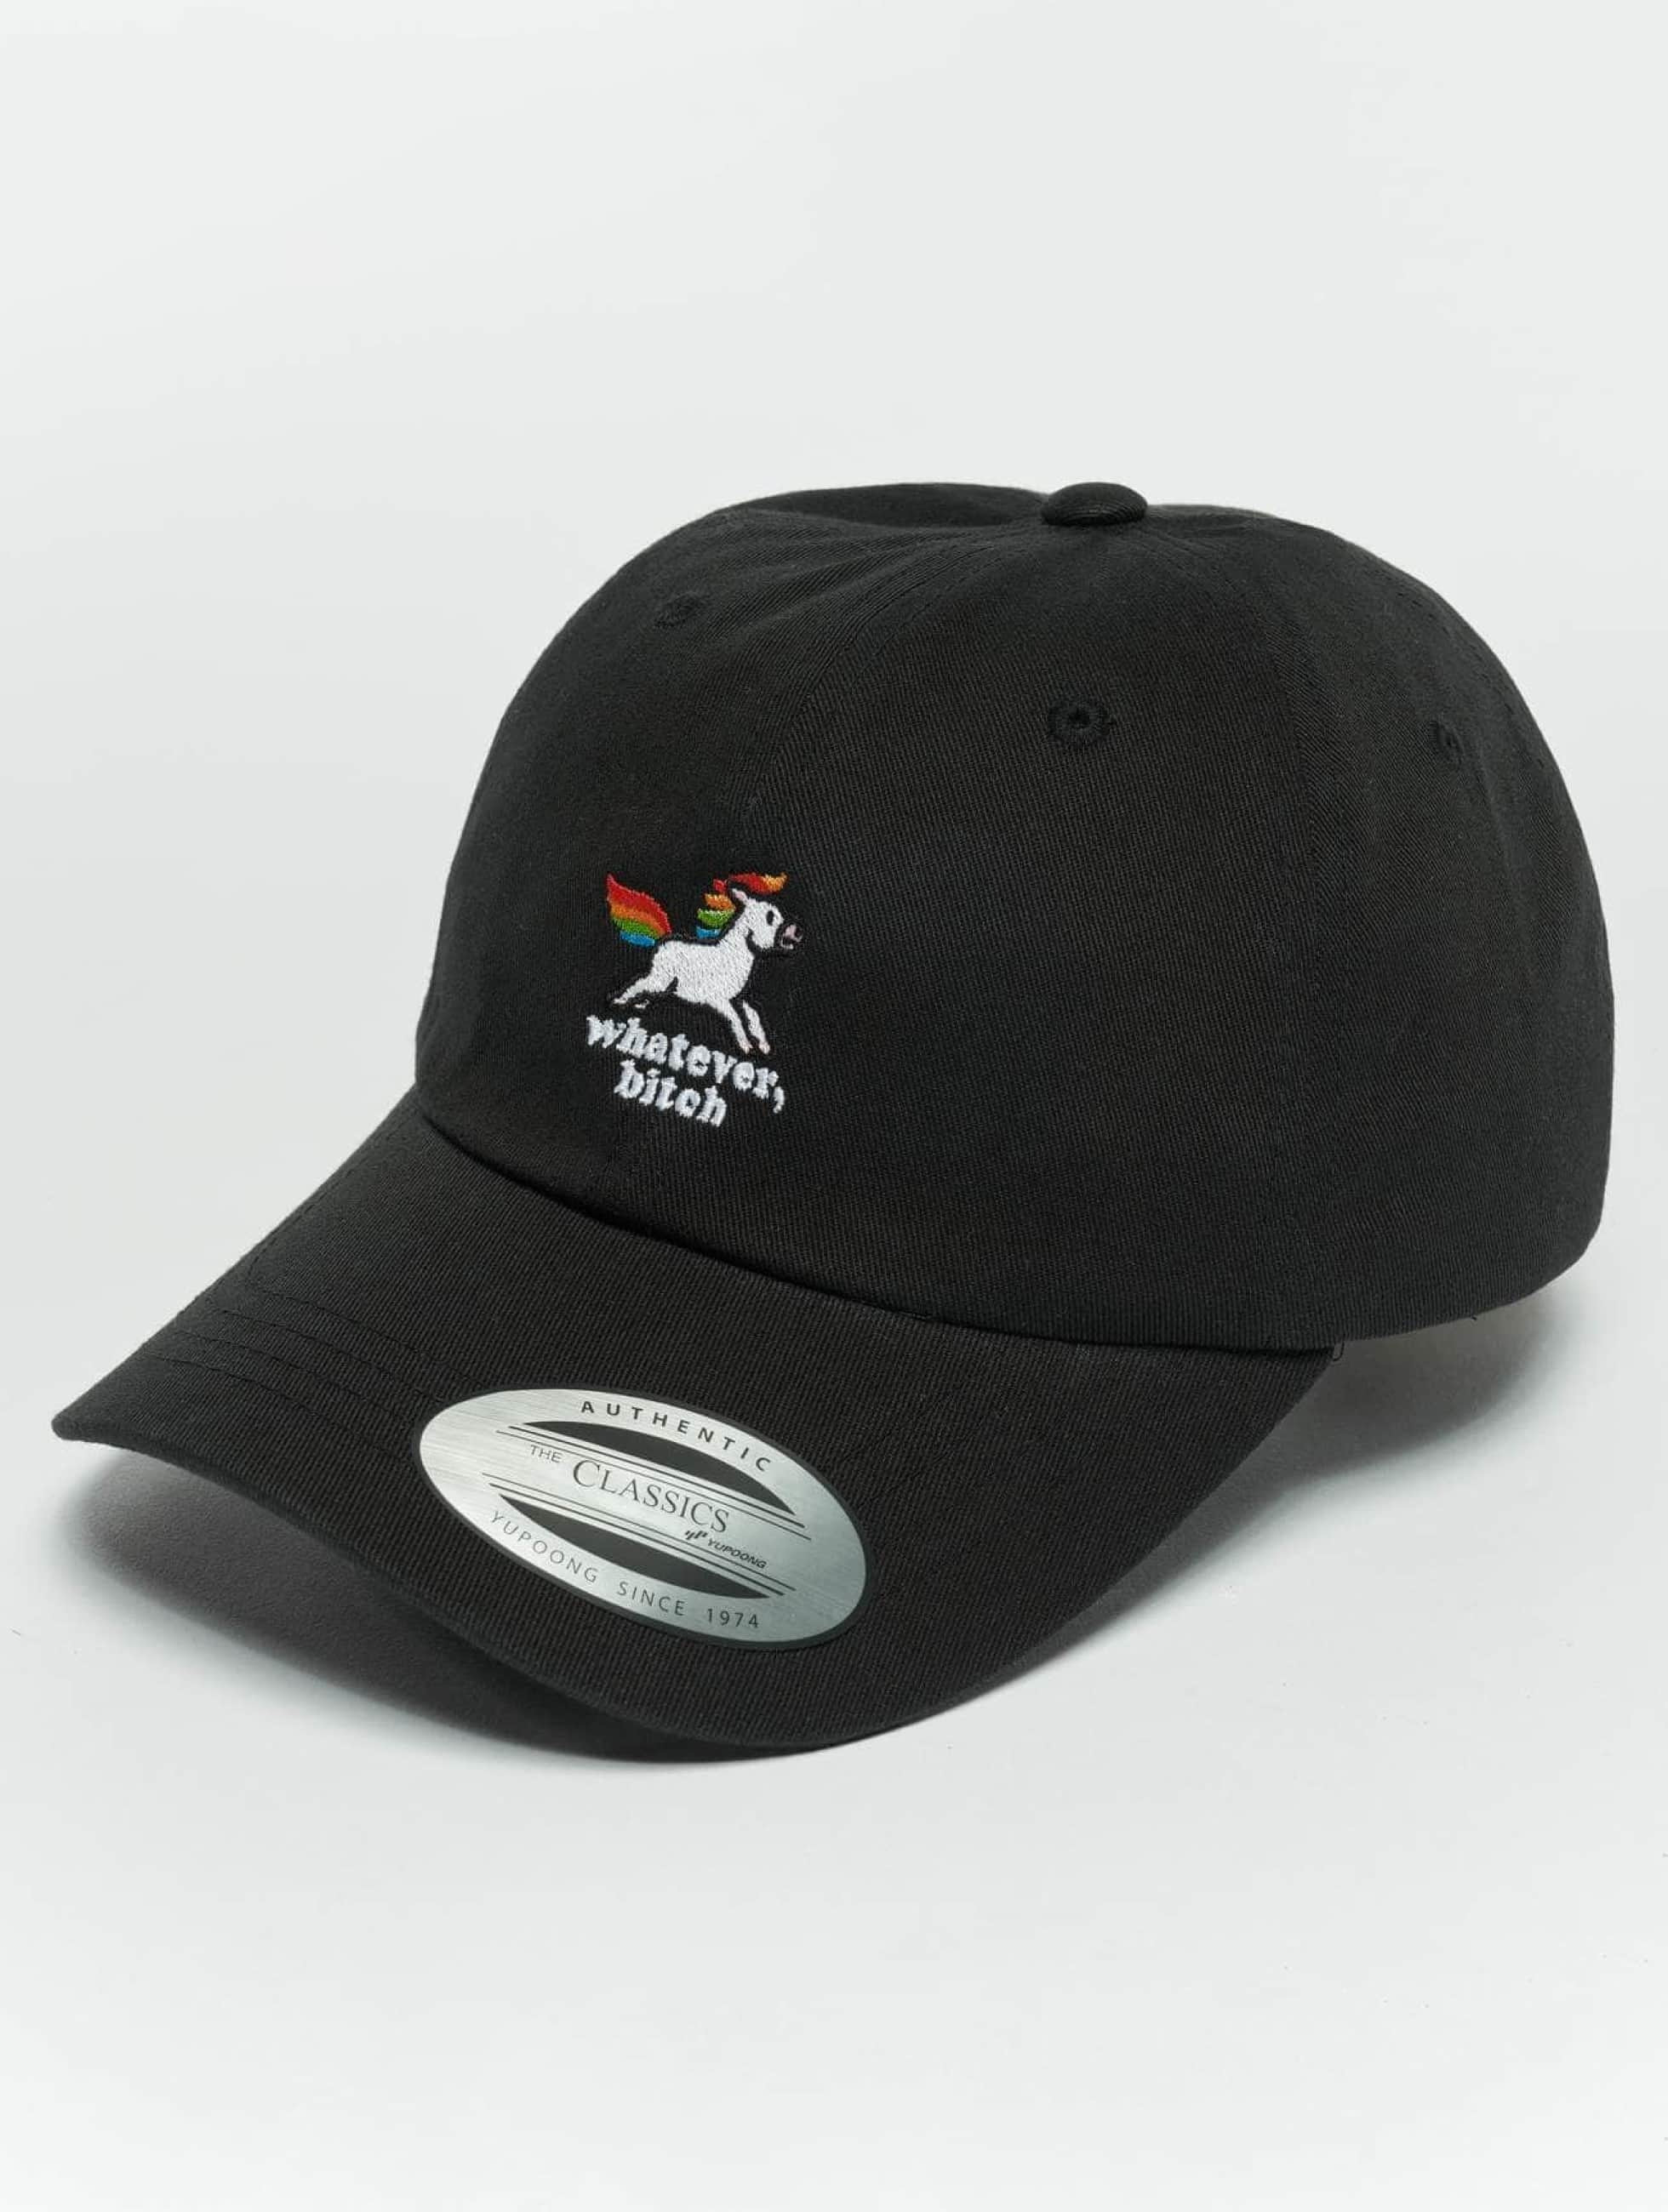 TurnUP Snapback Caps Whatever sort